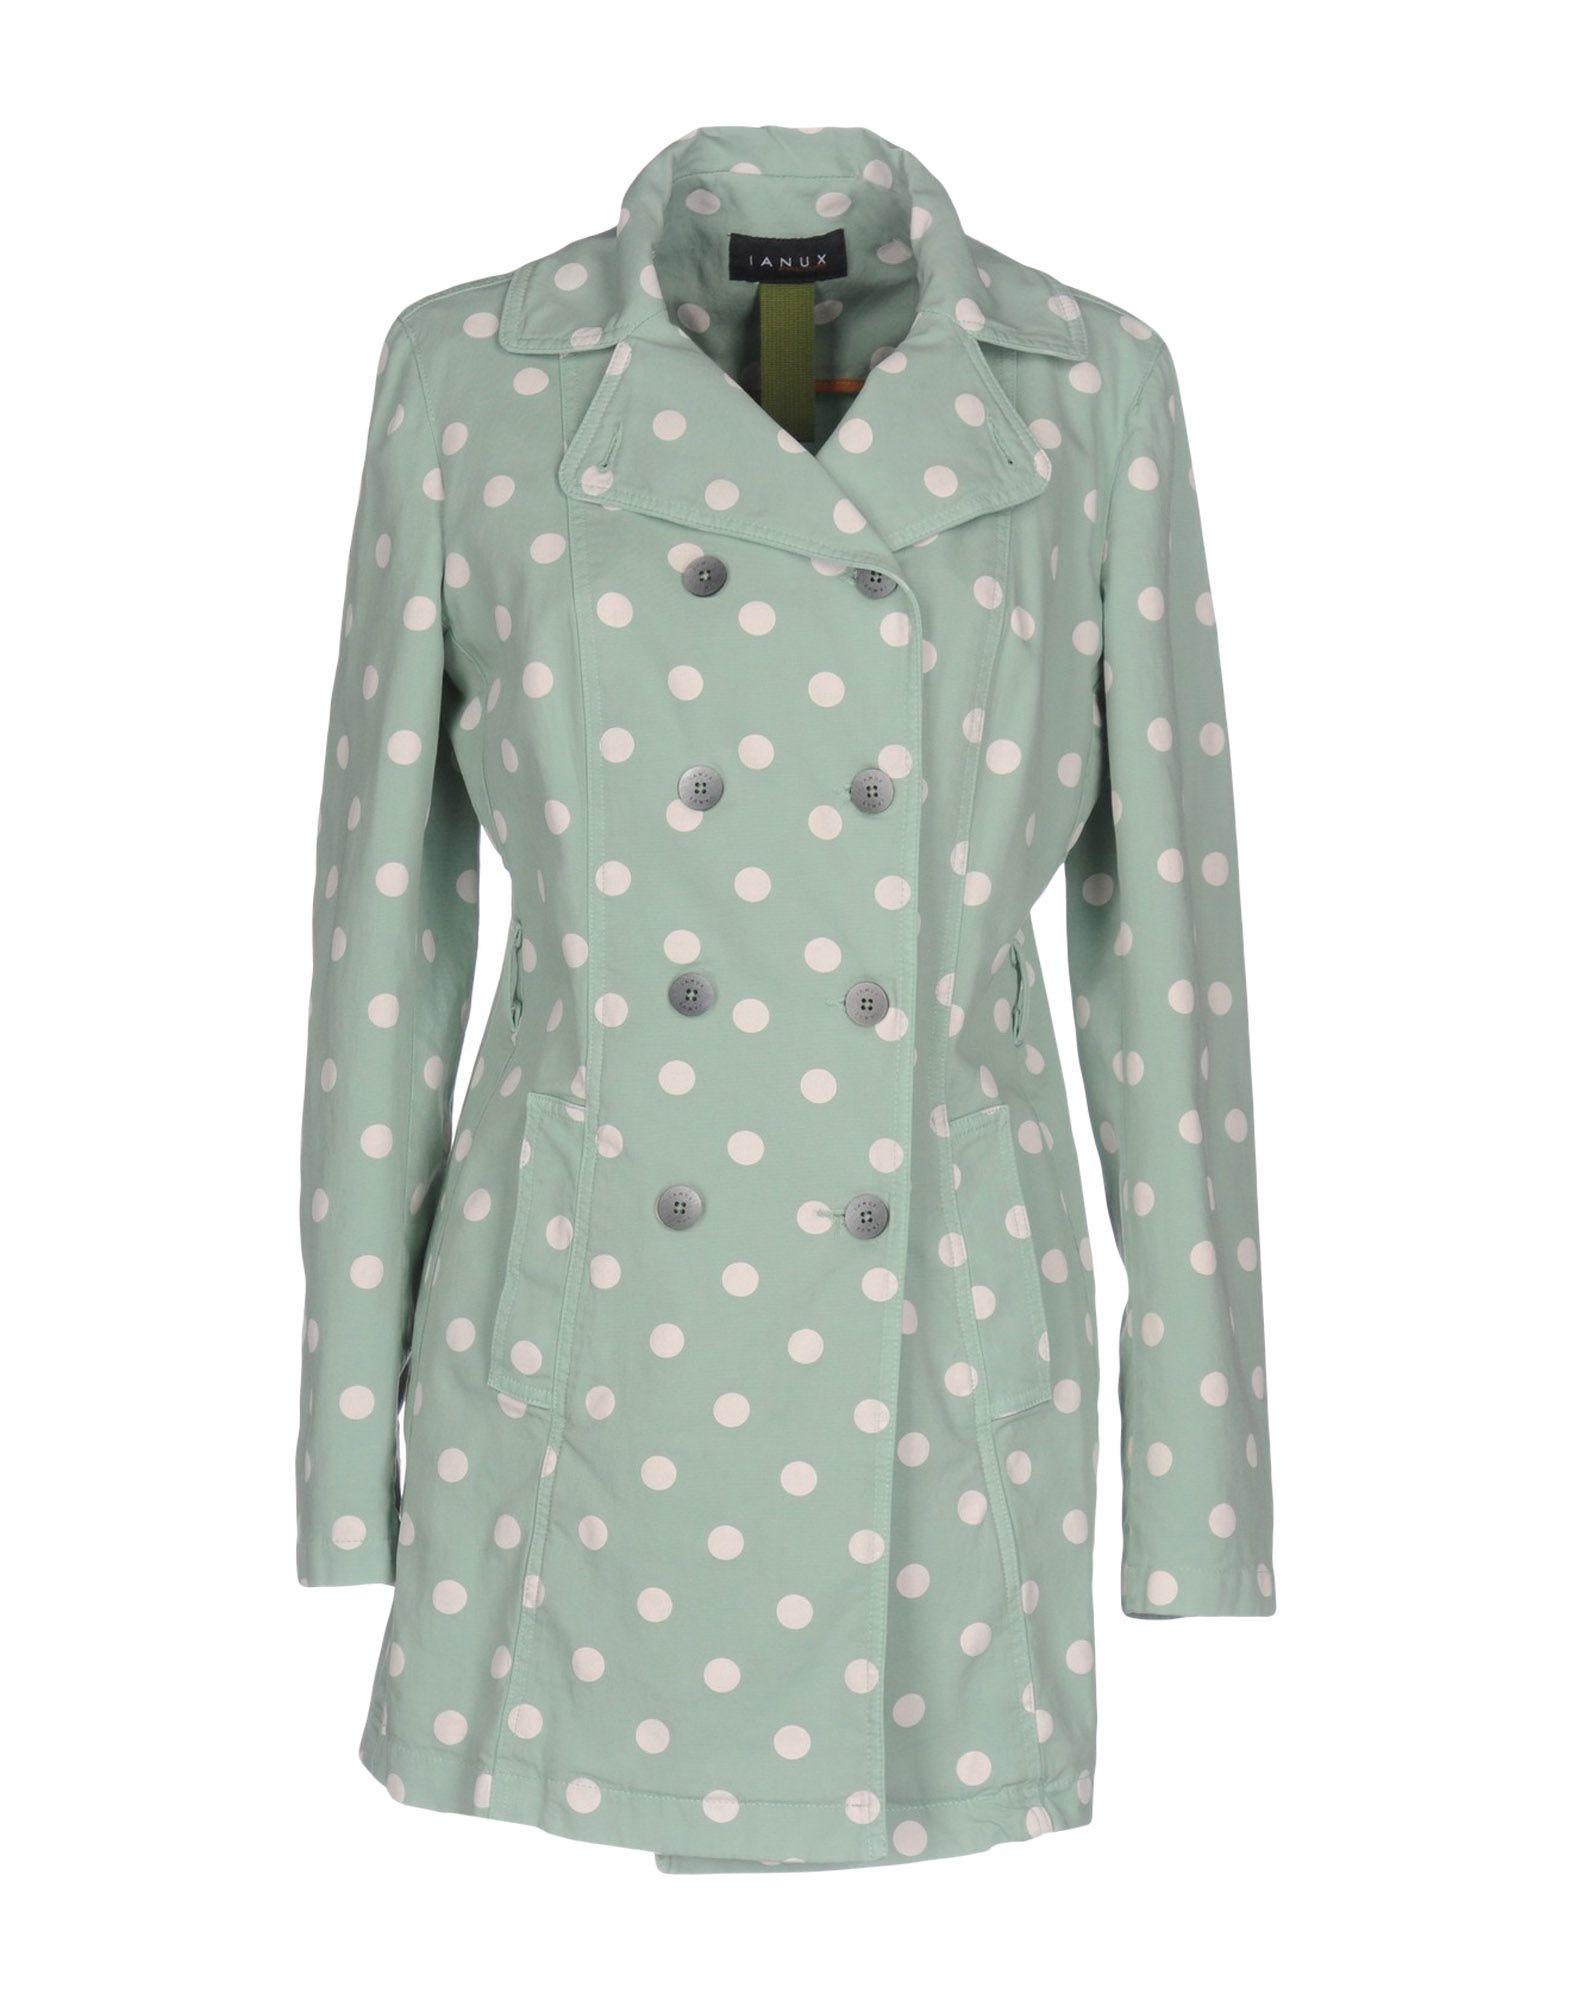 IANUX Легкое пальто mresale легкое пальто